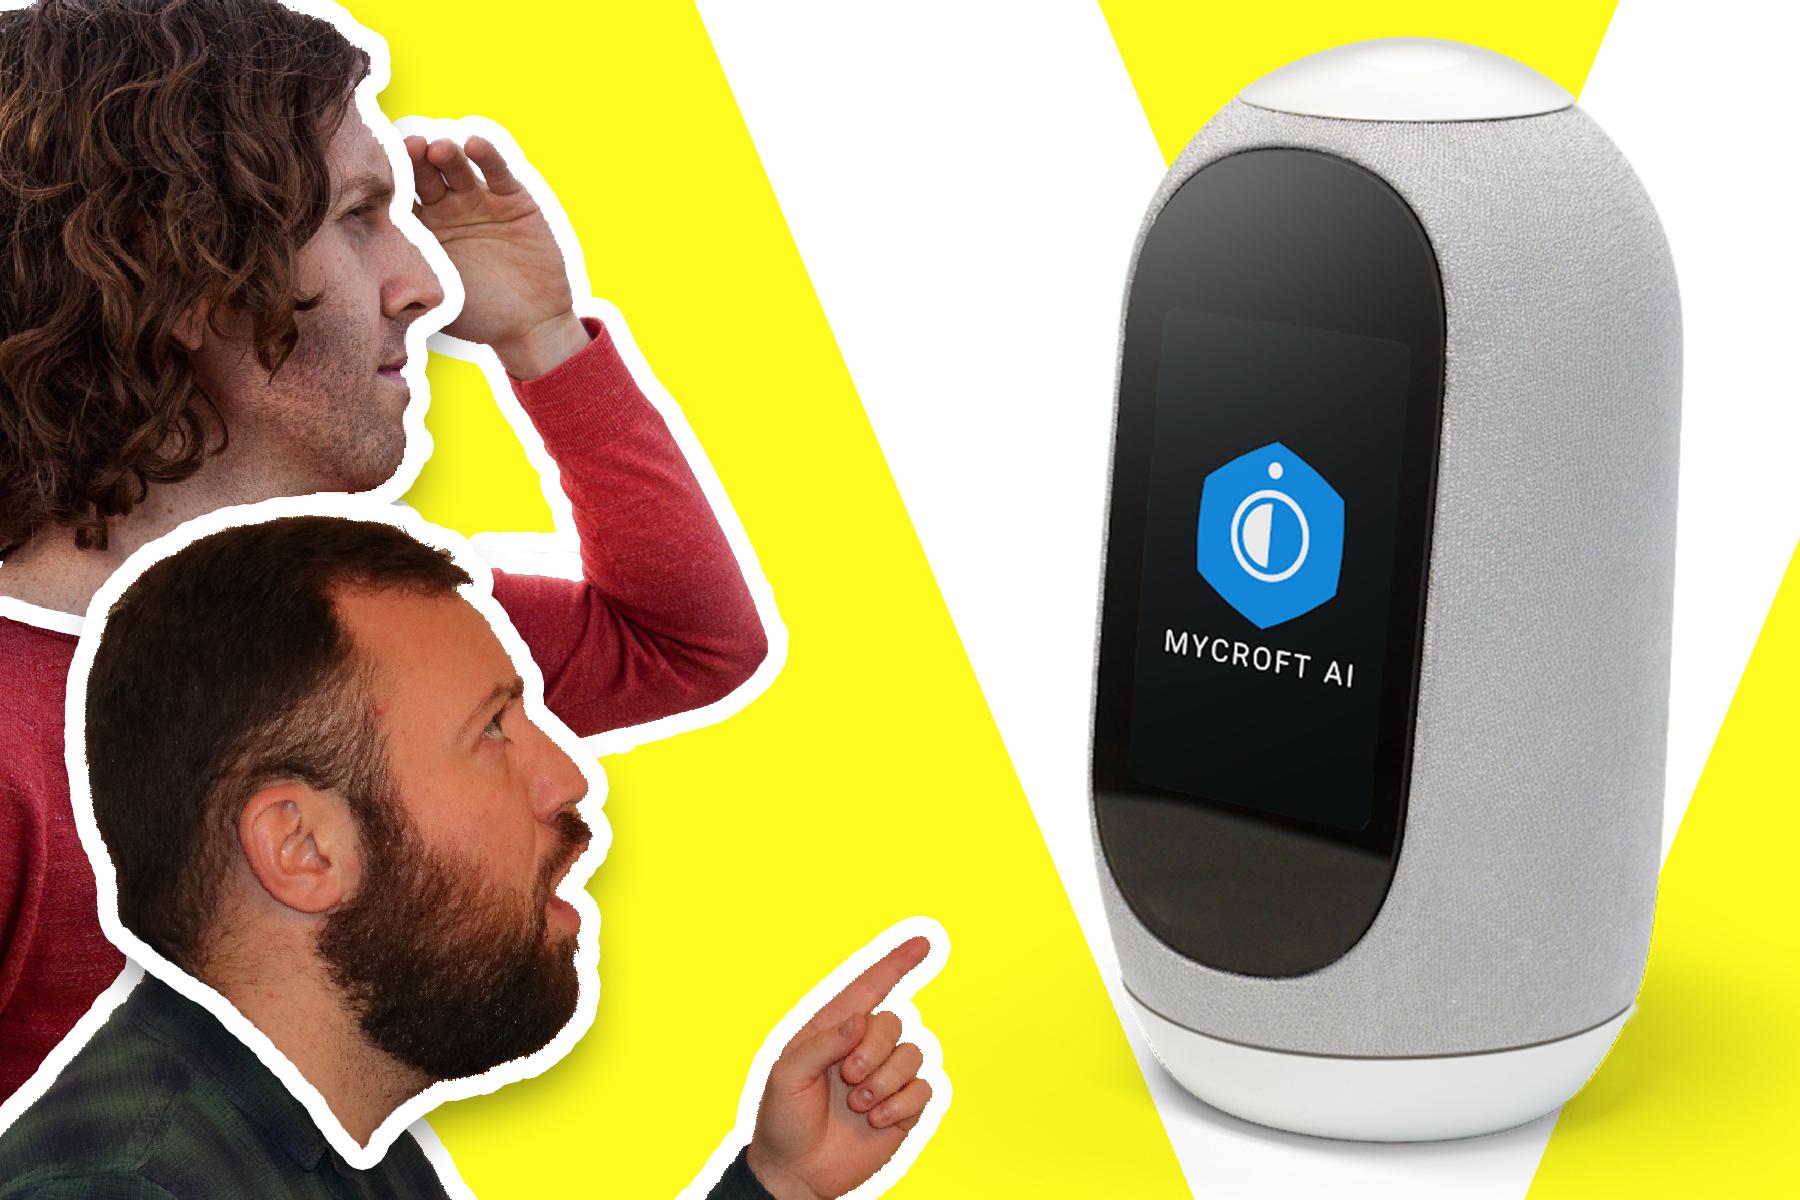 Kane Simms and Dustin Coates looking toward a Mycroft Mark II smart speaker